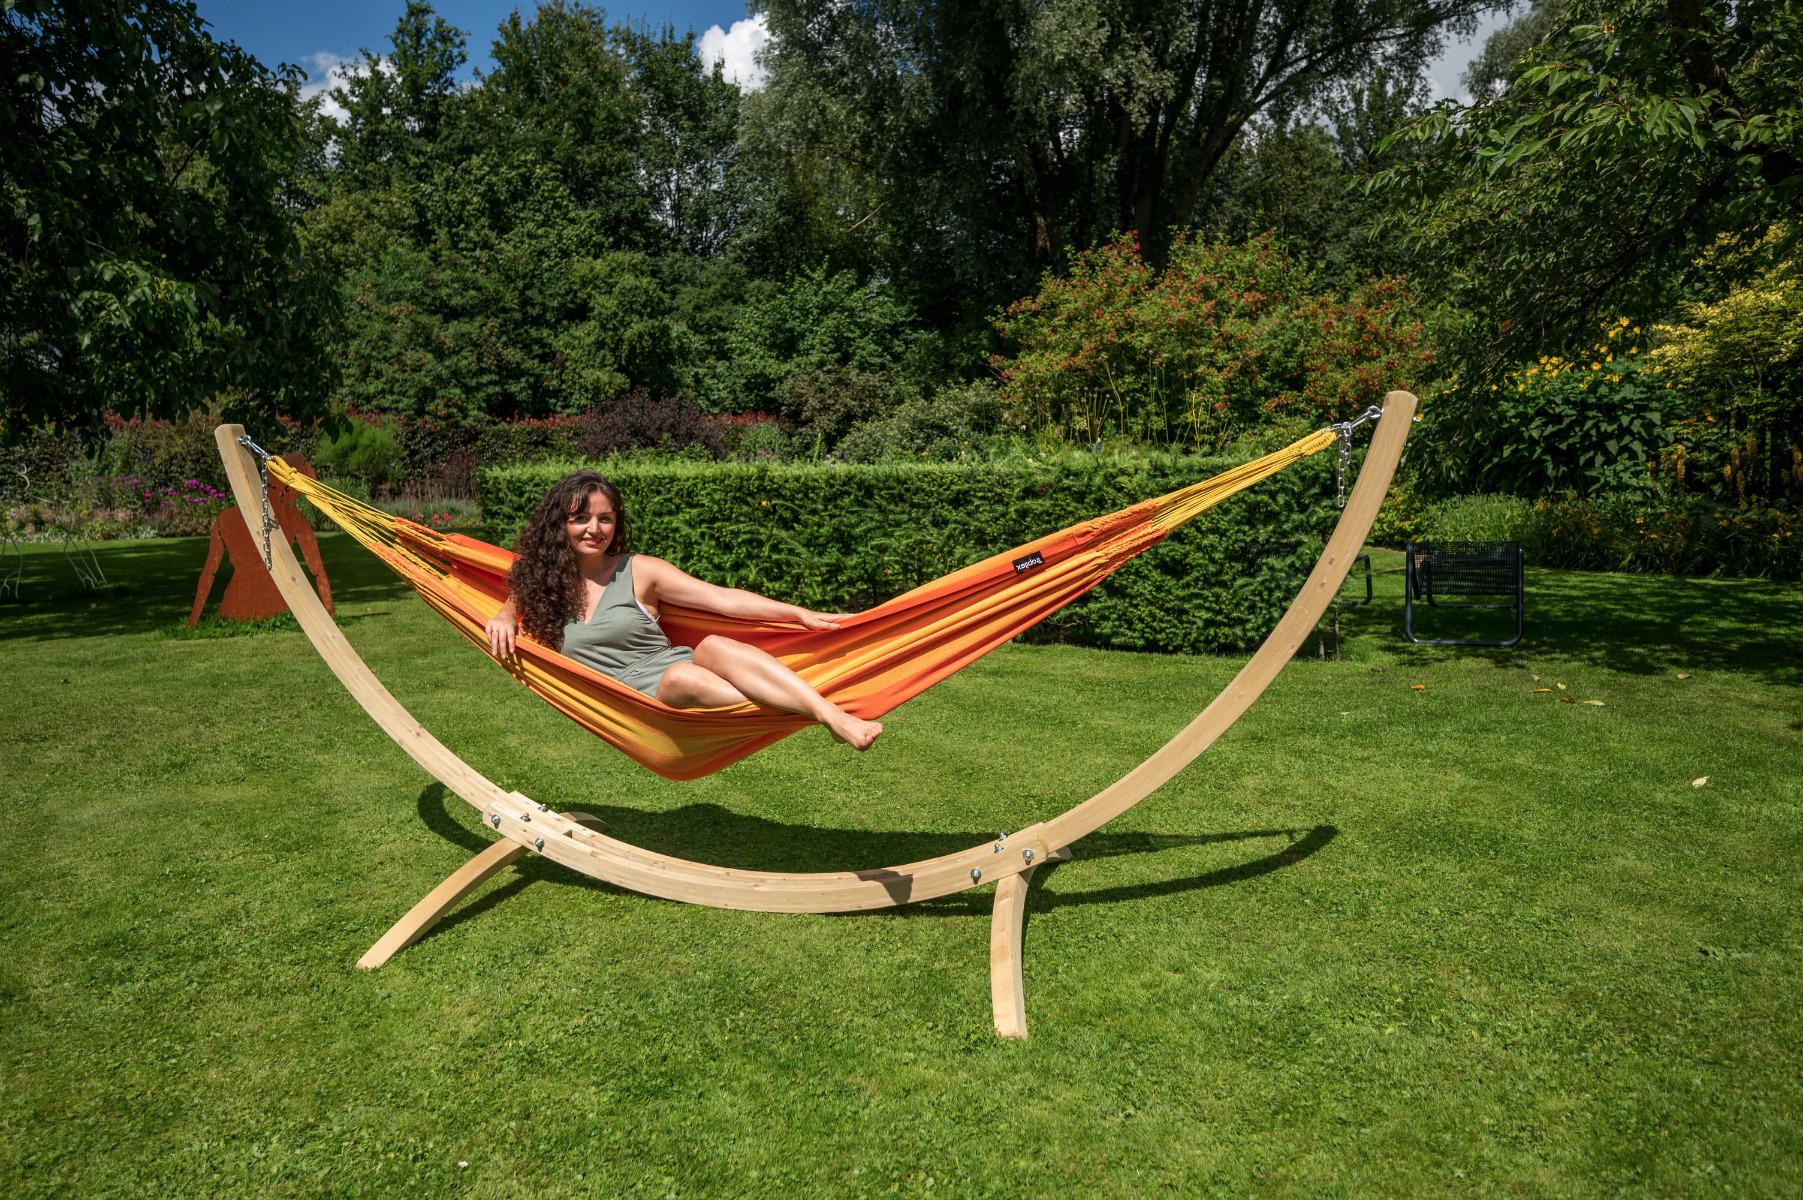 'Wood & Dream' Orange Eénpersoons Hangmatset - Oranje - Tropilex ®